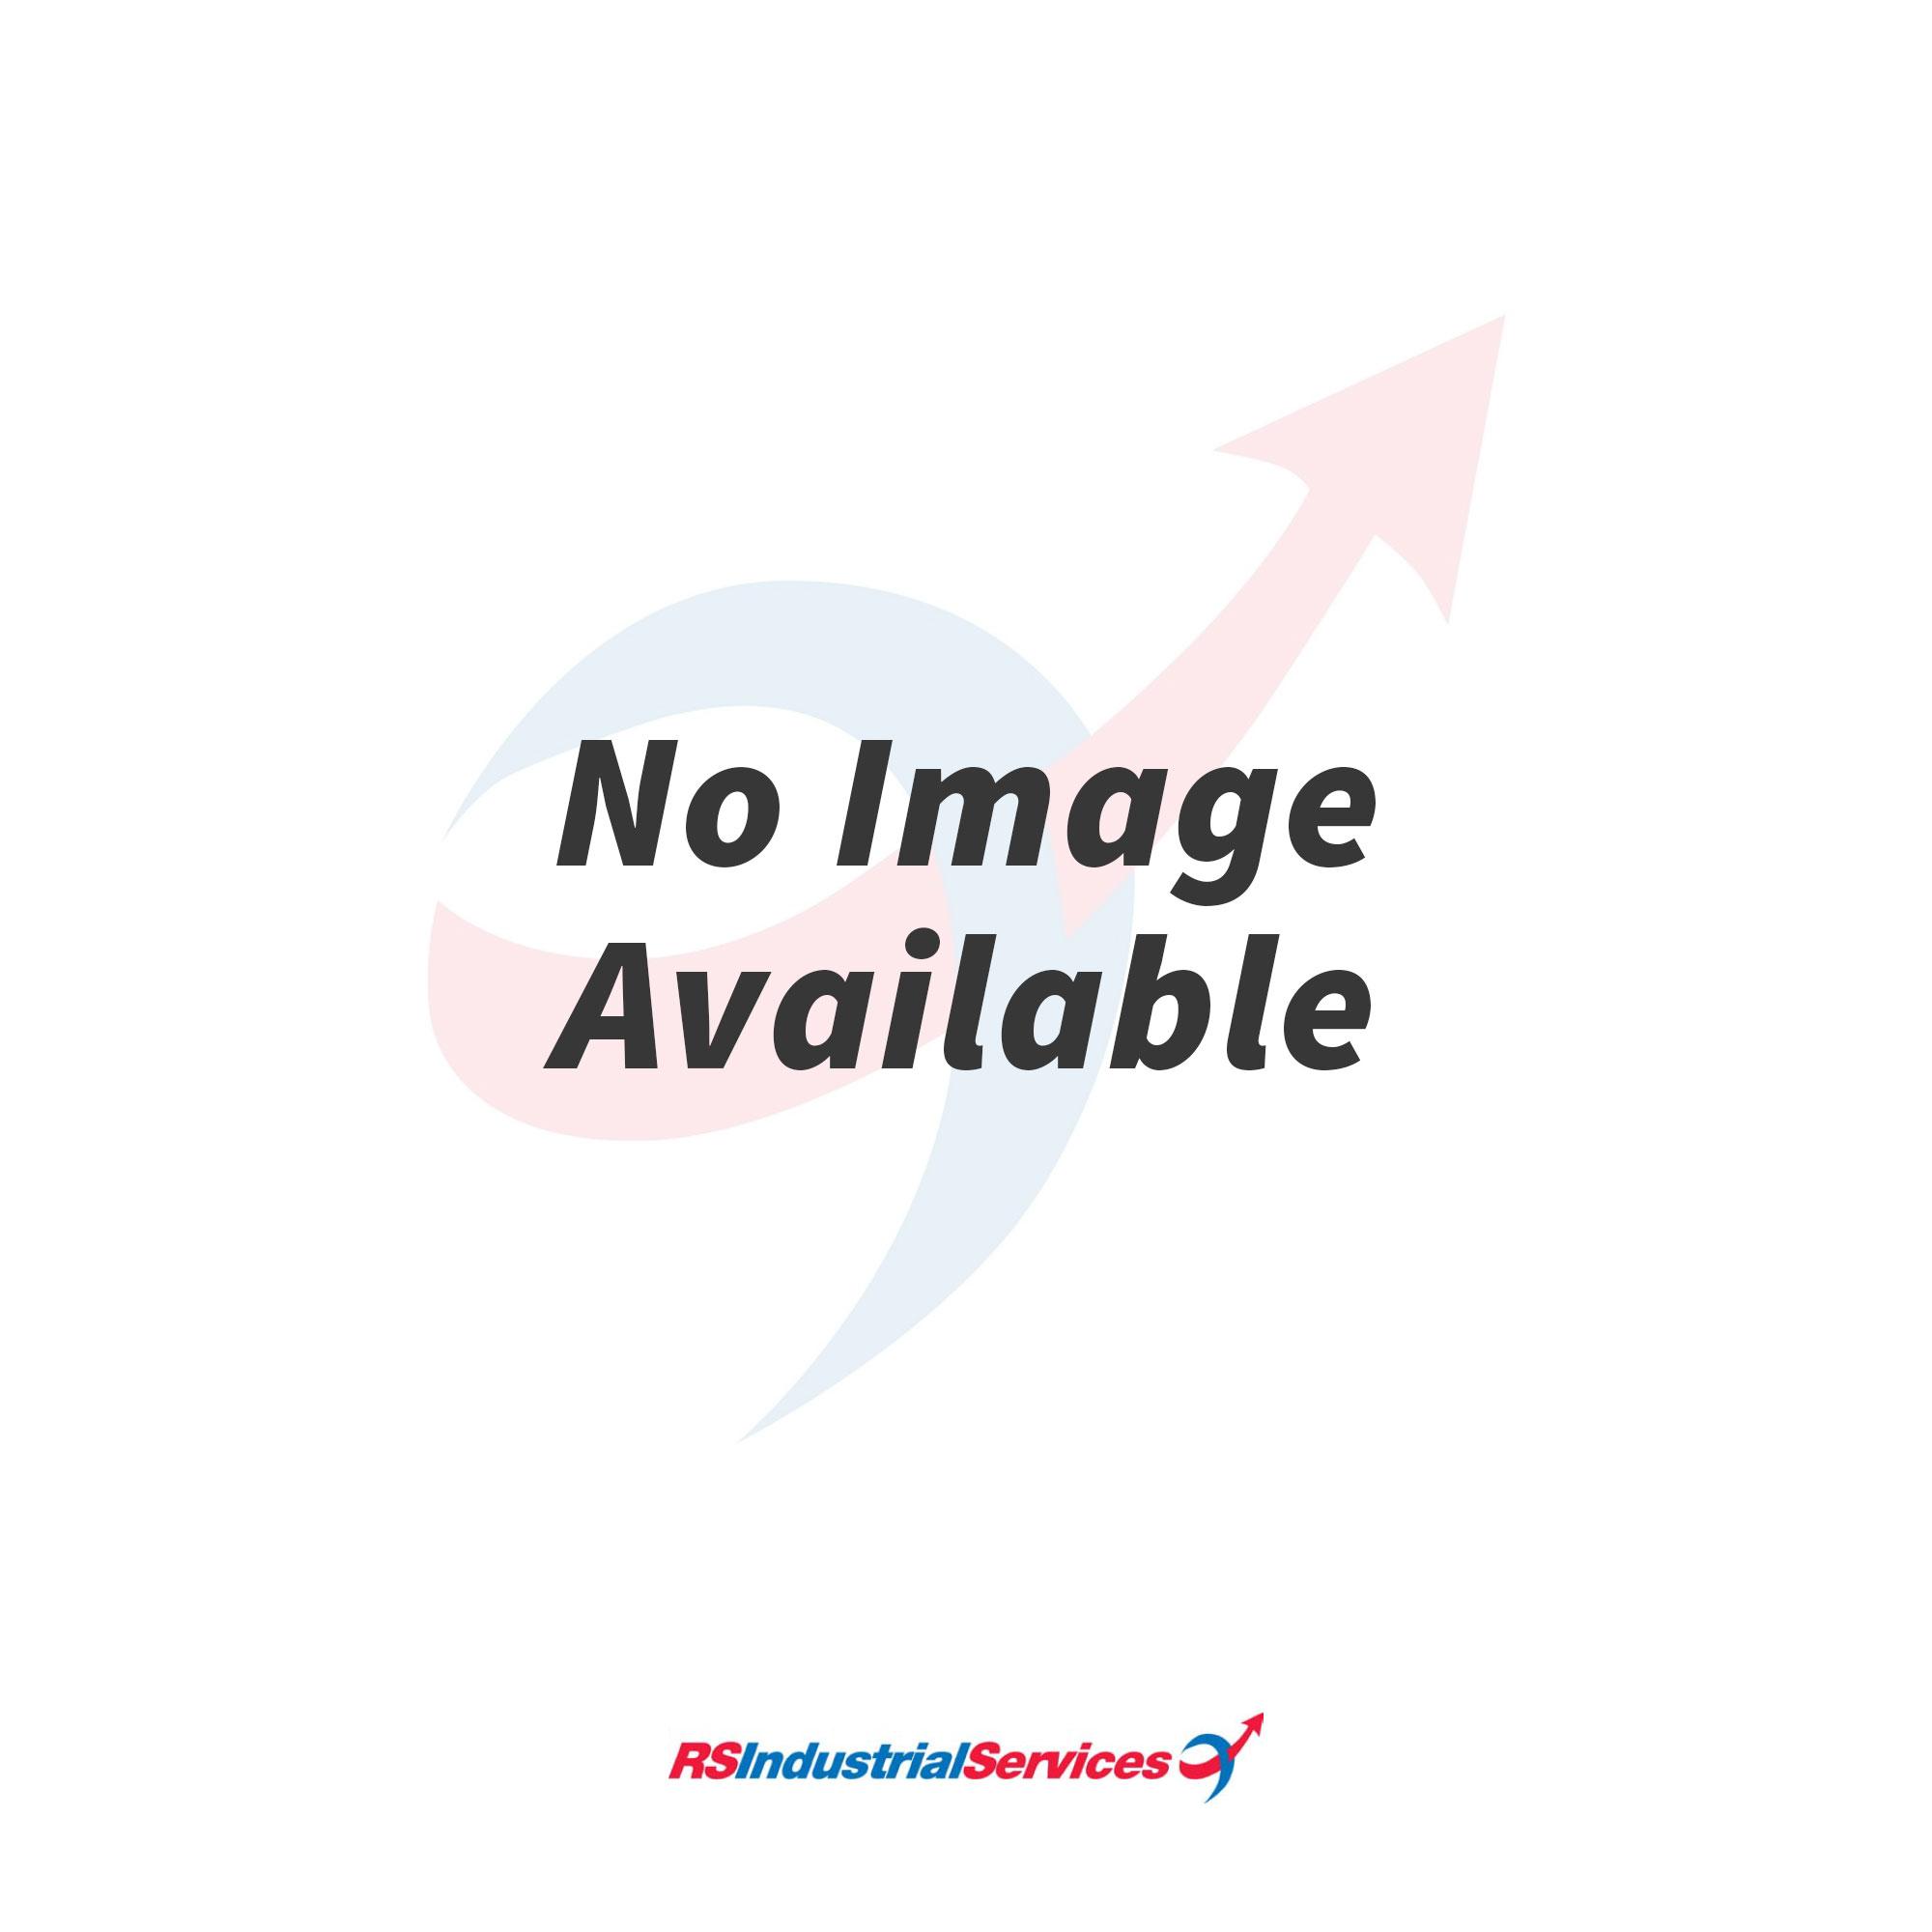 Bosch Red Wood Orbit Rectangular 8 Hole Velcro Sheets 93mm x 185mm (Pack of 10)